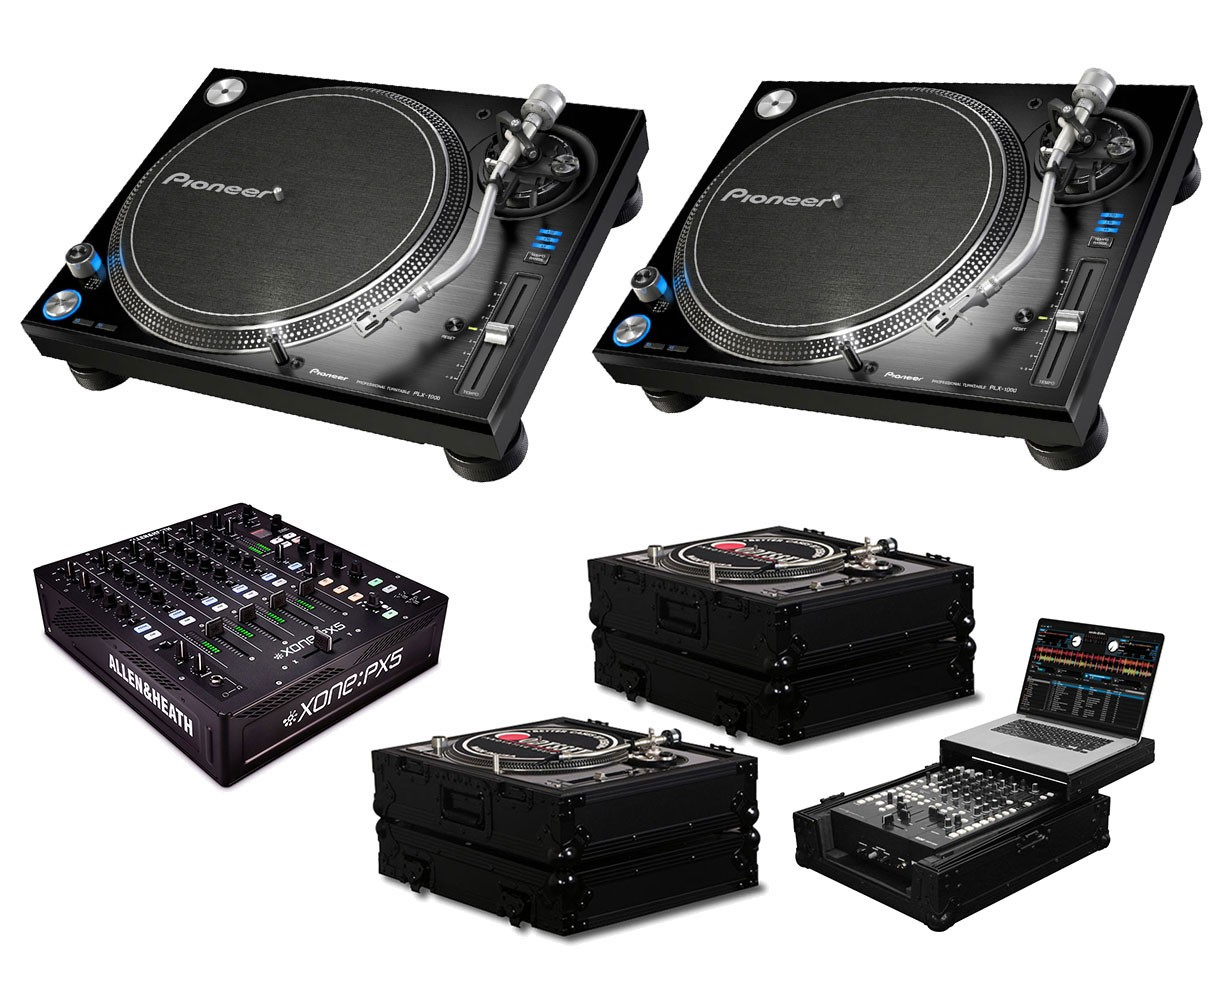 2x Pioneer PLX-1000 + Xone:PX5 + Black Label Cases + Glide Style Case